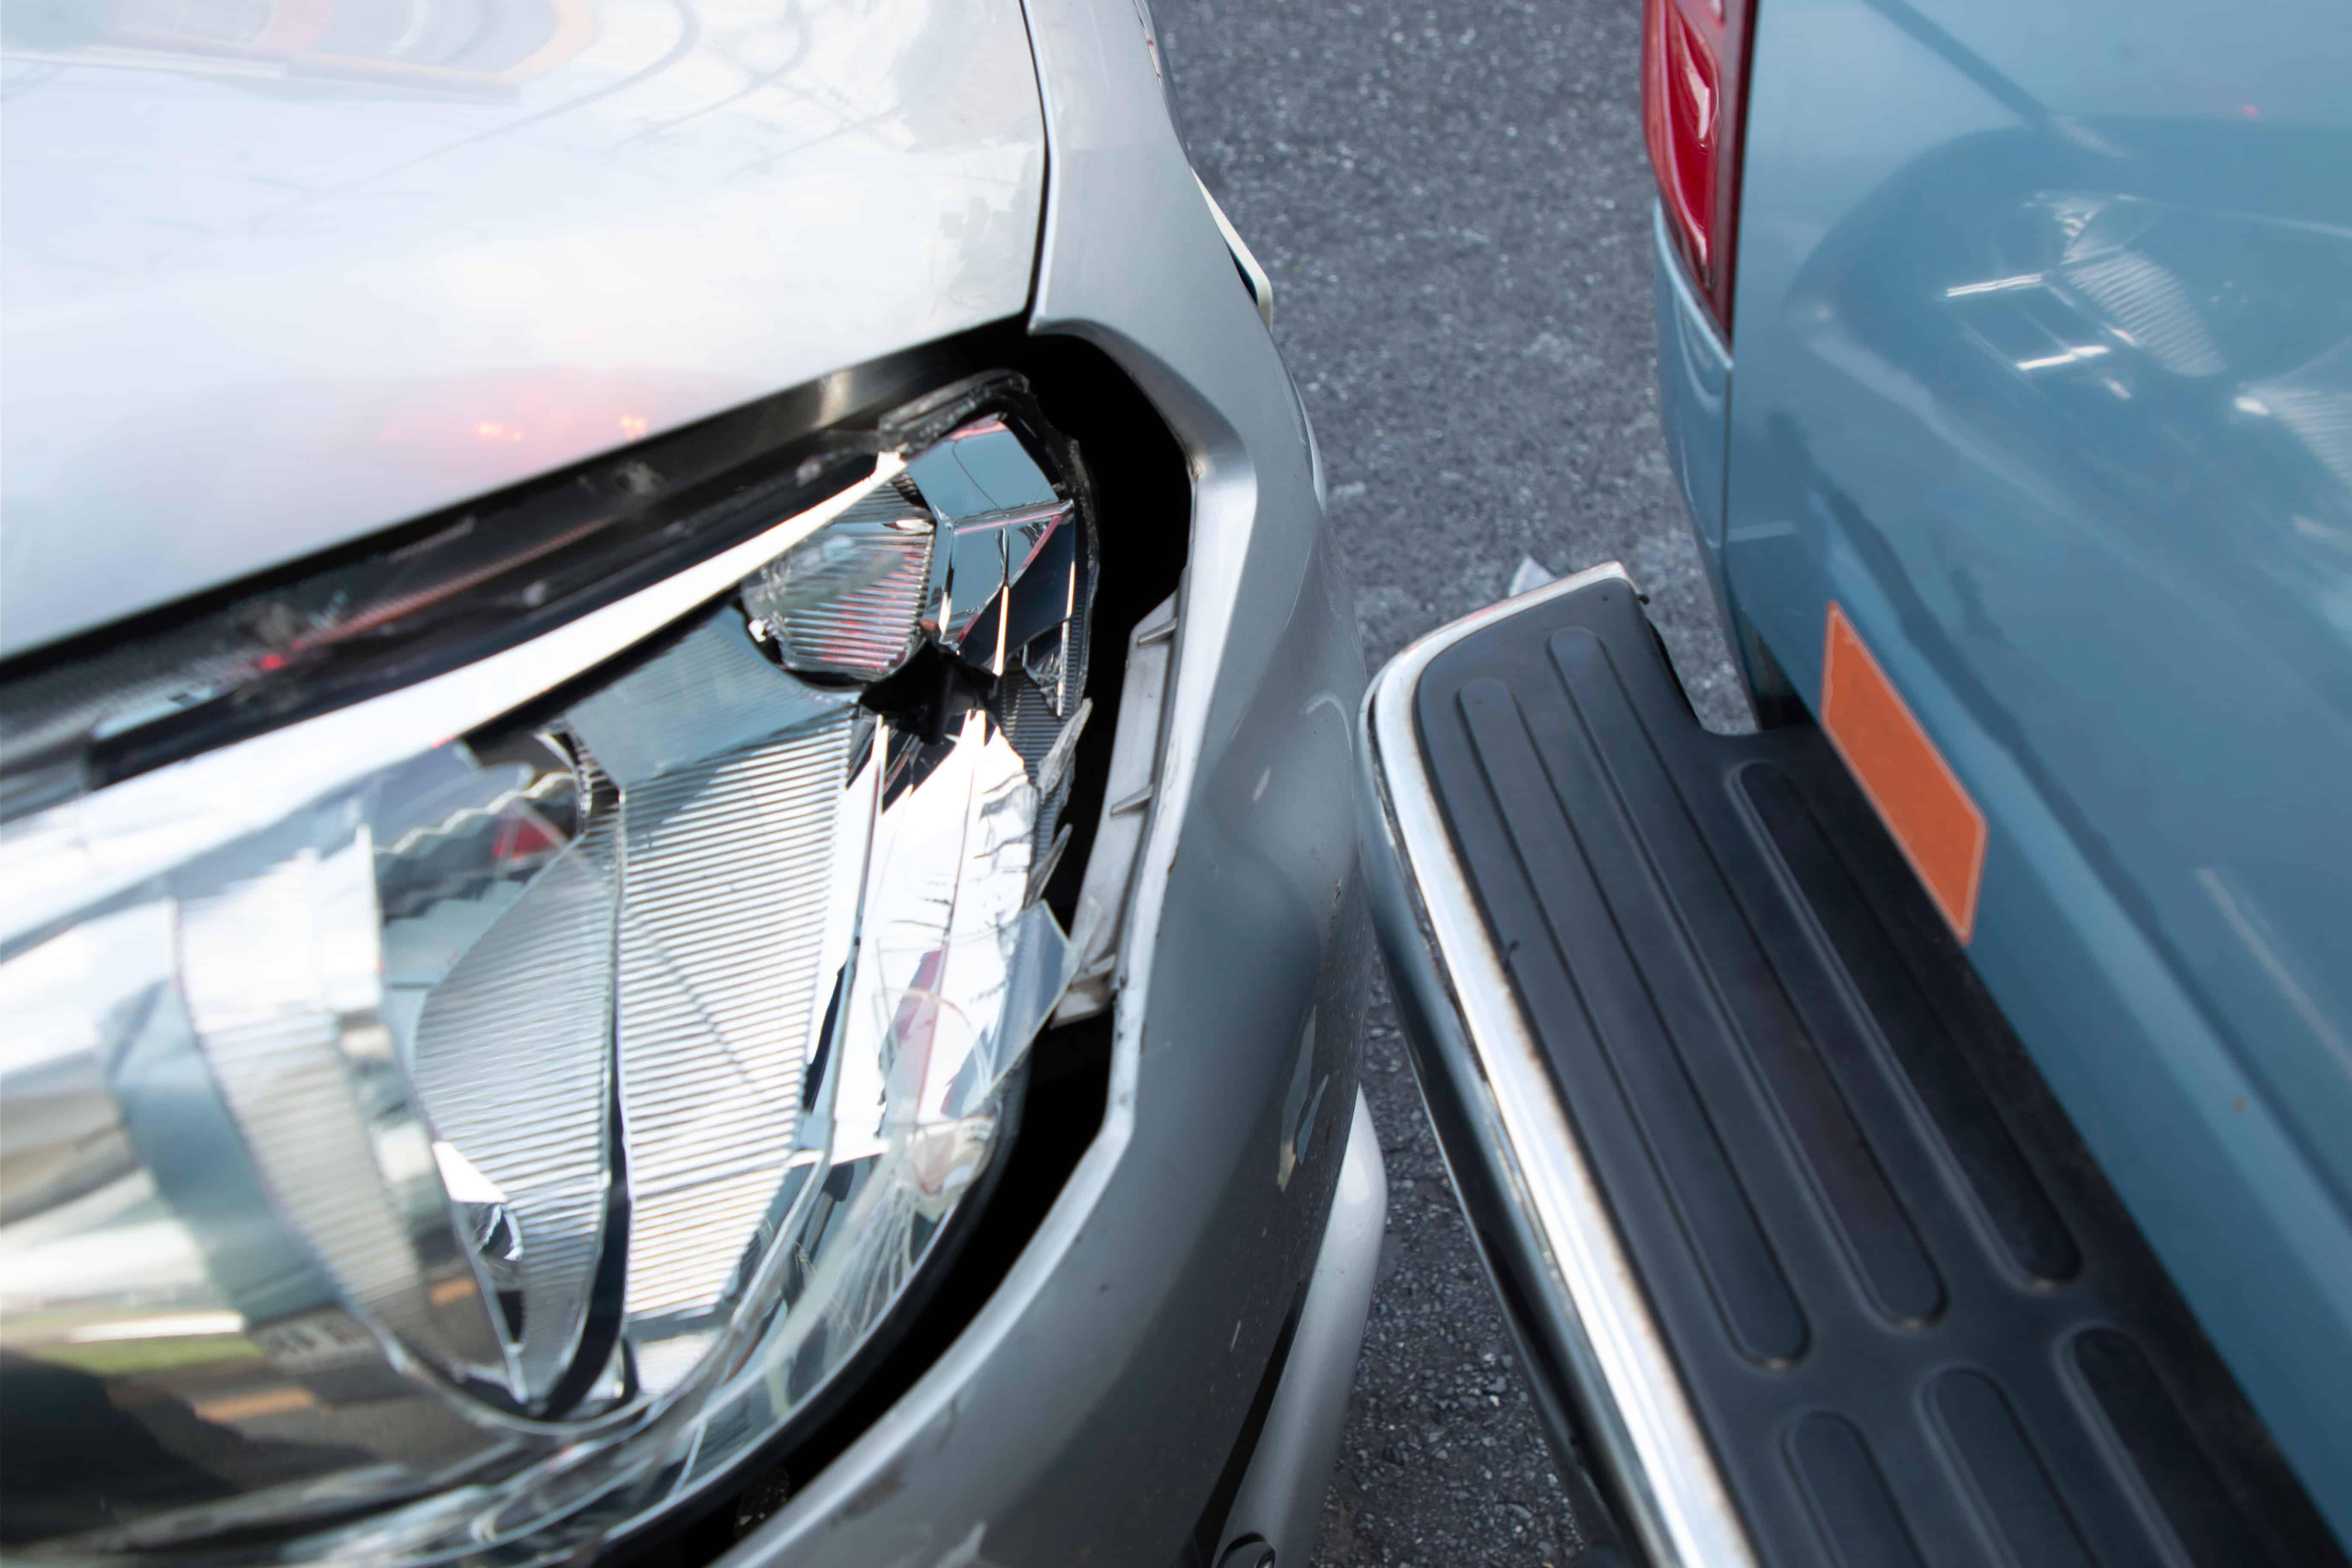 1 Person Dead in Three-Vehicle Crash near Power Inn and Fruitridge Road [Sacramento, CA]